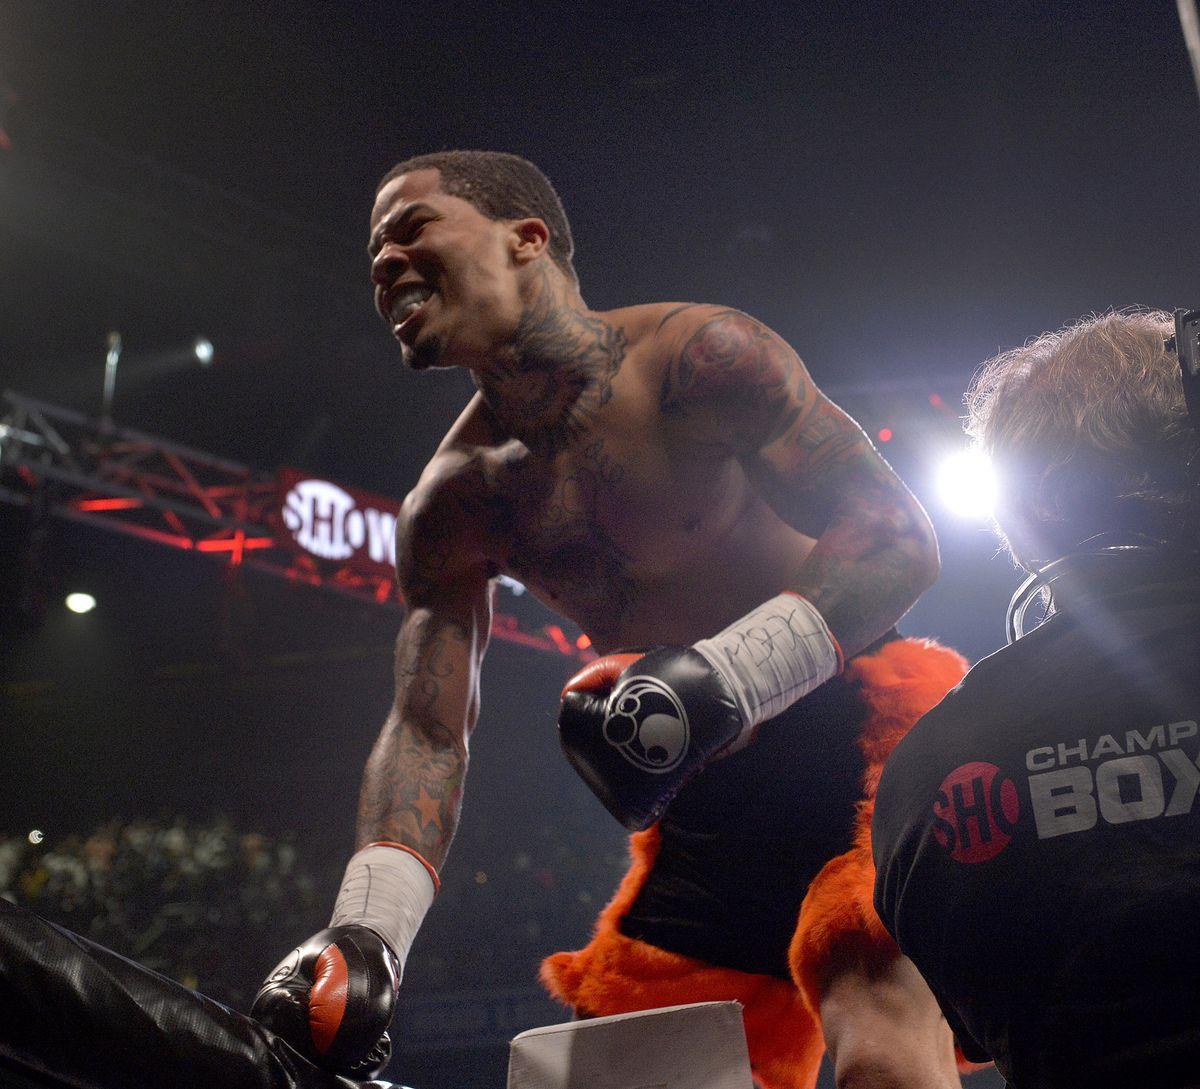 Parade honoring Baltimore boxer Gervonta Davis set for Oct. 26 in the city